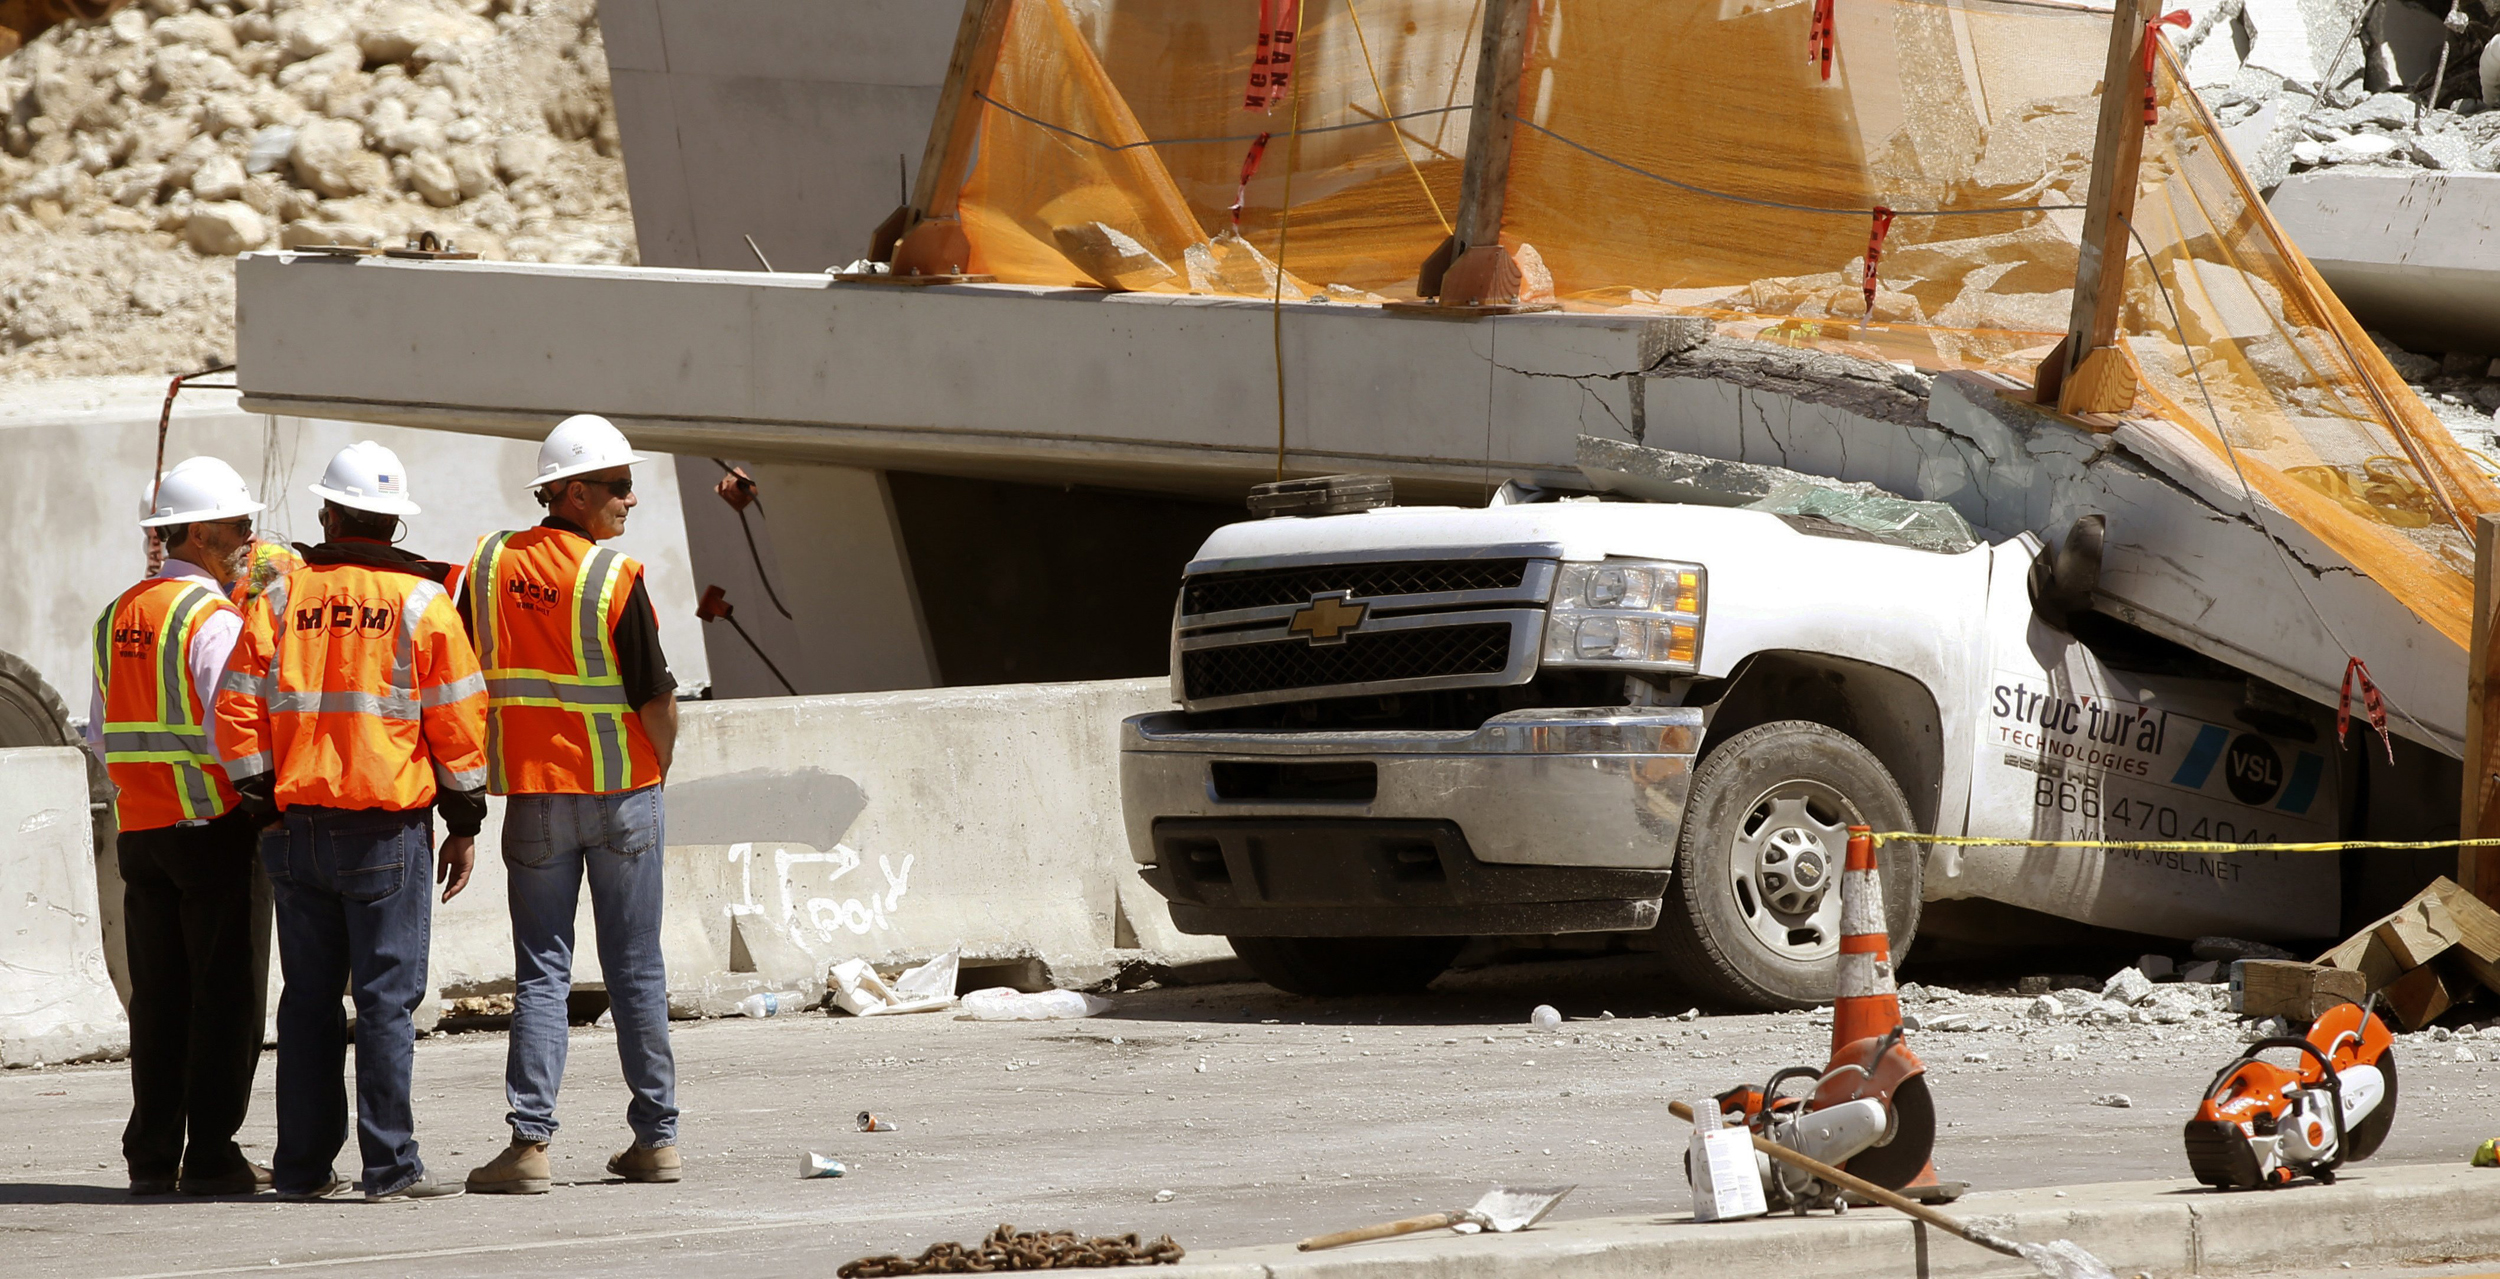 Engineers saw cracks in Miami bridge days before collapse